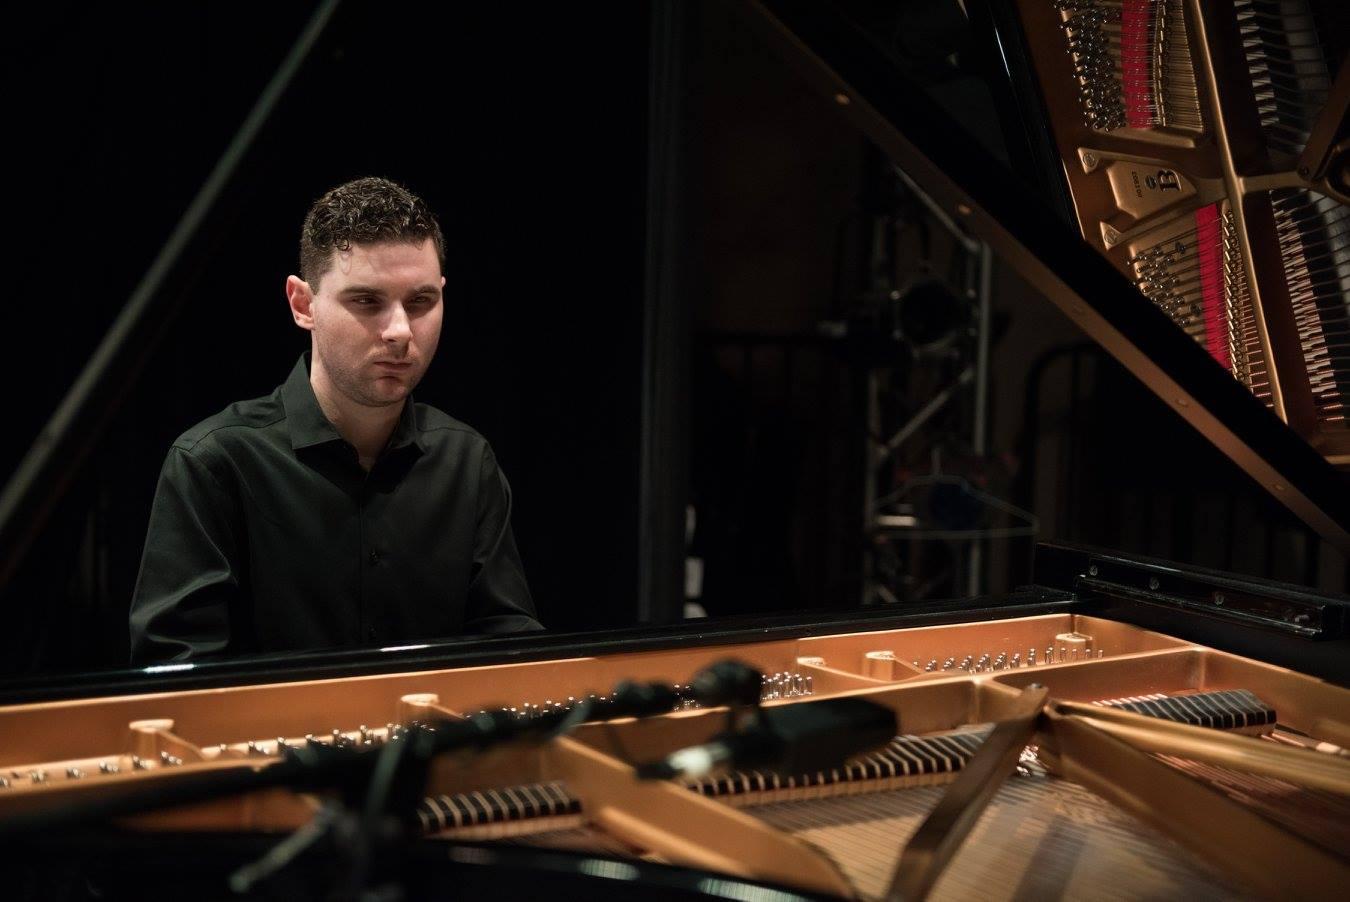 Elliott McClain Piano 3.jpg